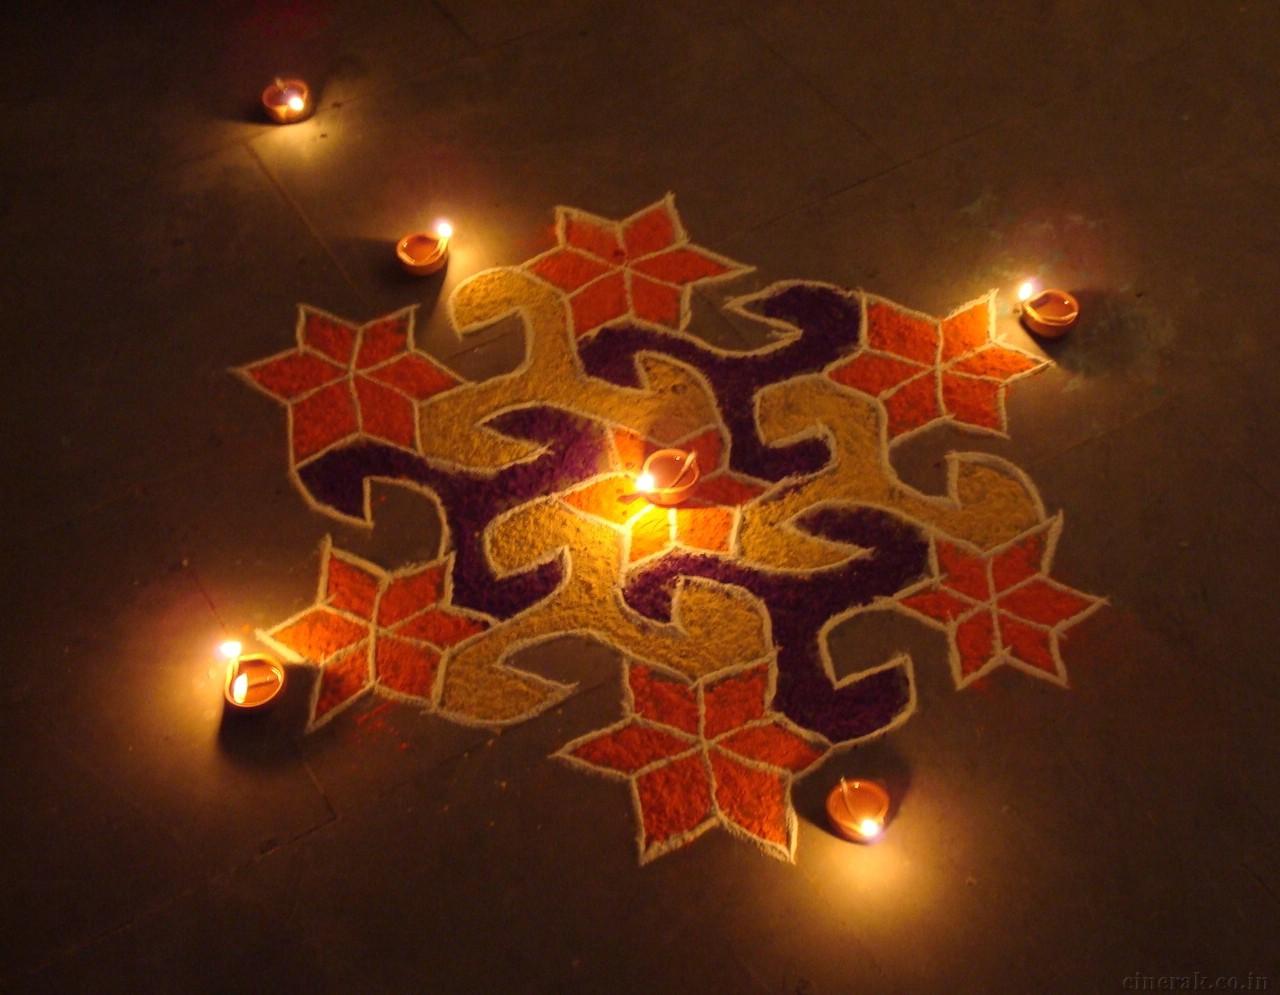 http://4.bp.blogspot.com/-zD3KPQJV41s/UJ1LEfEtr9I/AAAAAAAAYjI/t5pIplFC18s/s1600/Happy-Diwali-2012-Wallpapers+(3).jpg